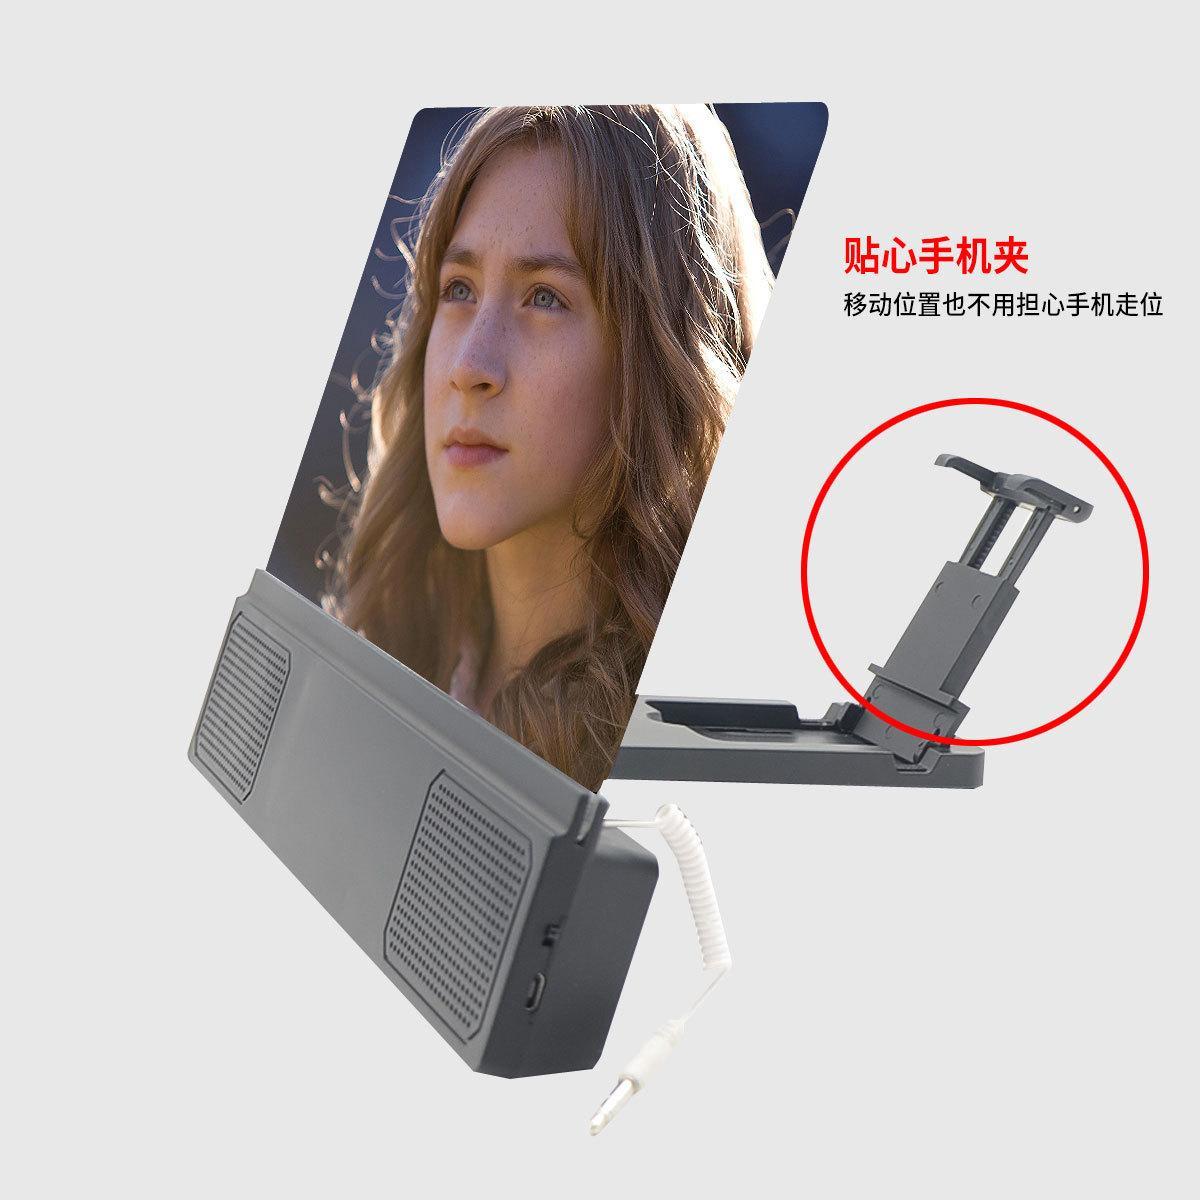 12 İnç 3D Cep Telefonu Ekran Büyüteç Stereo Bluetooth Hoparlör HD Video Amplifikatör